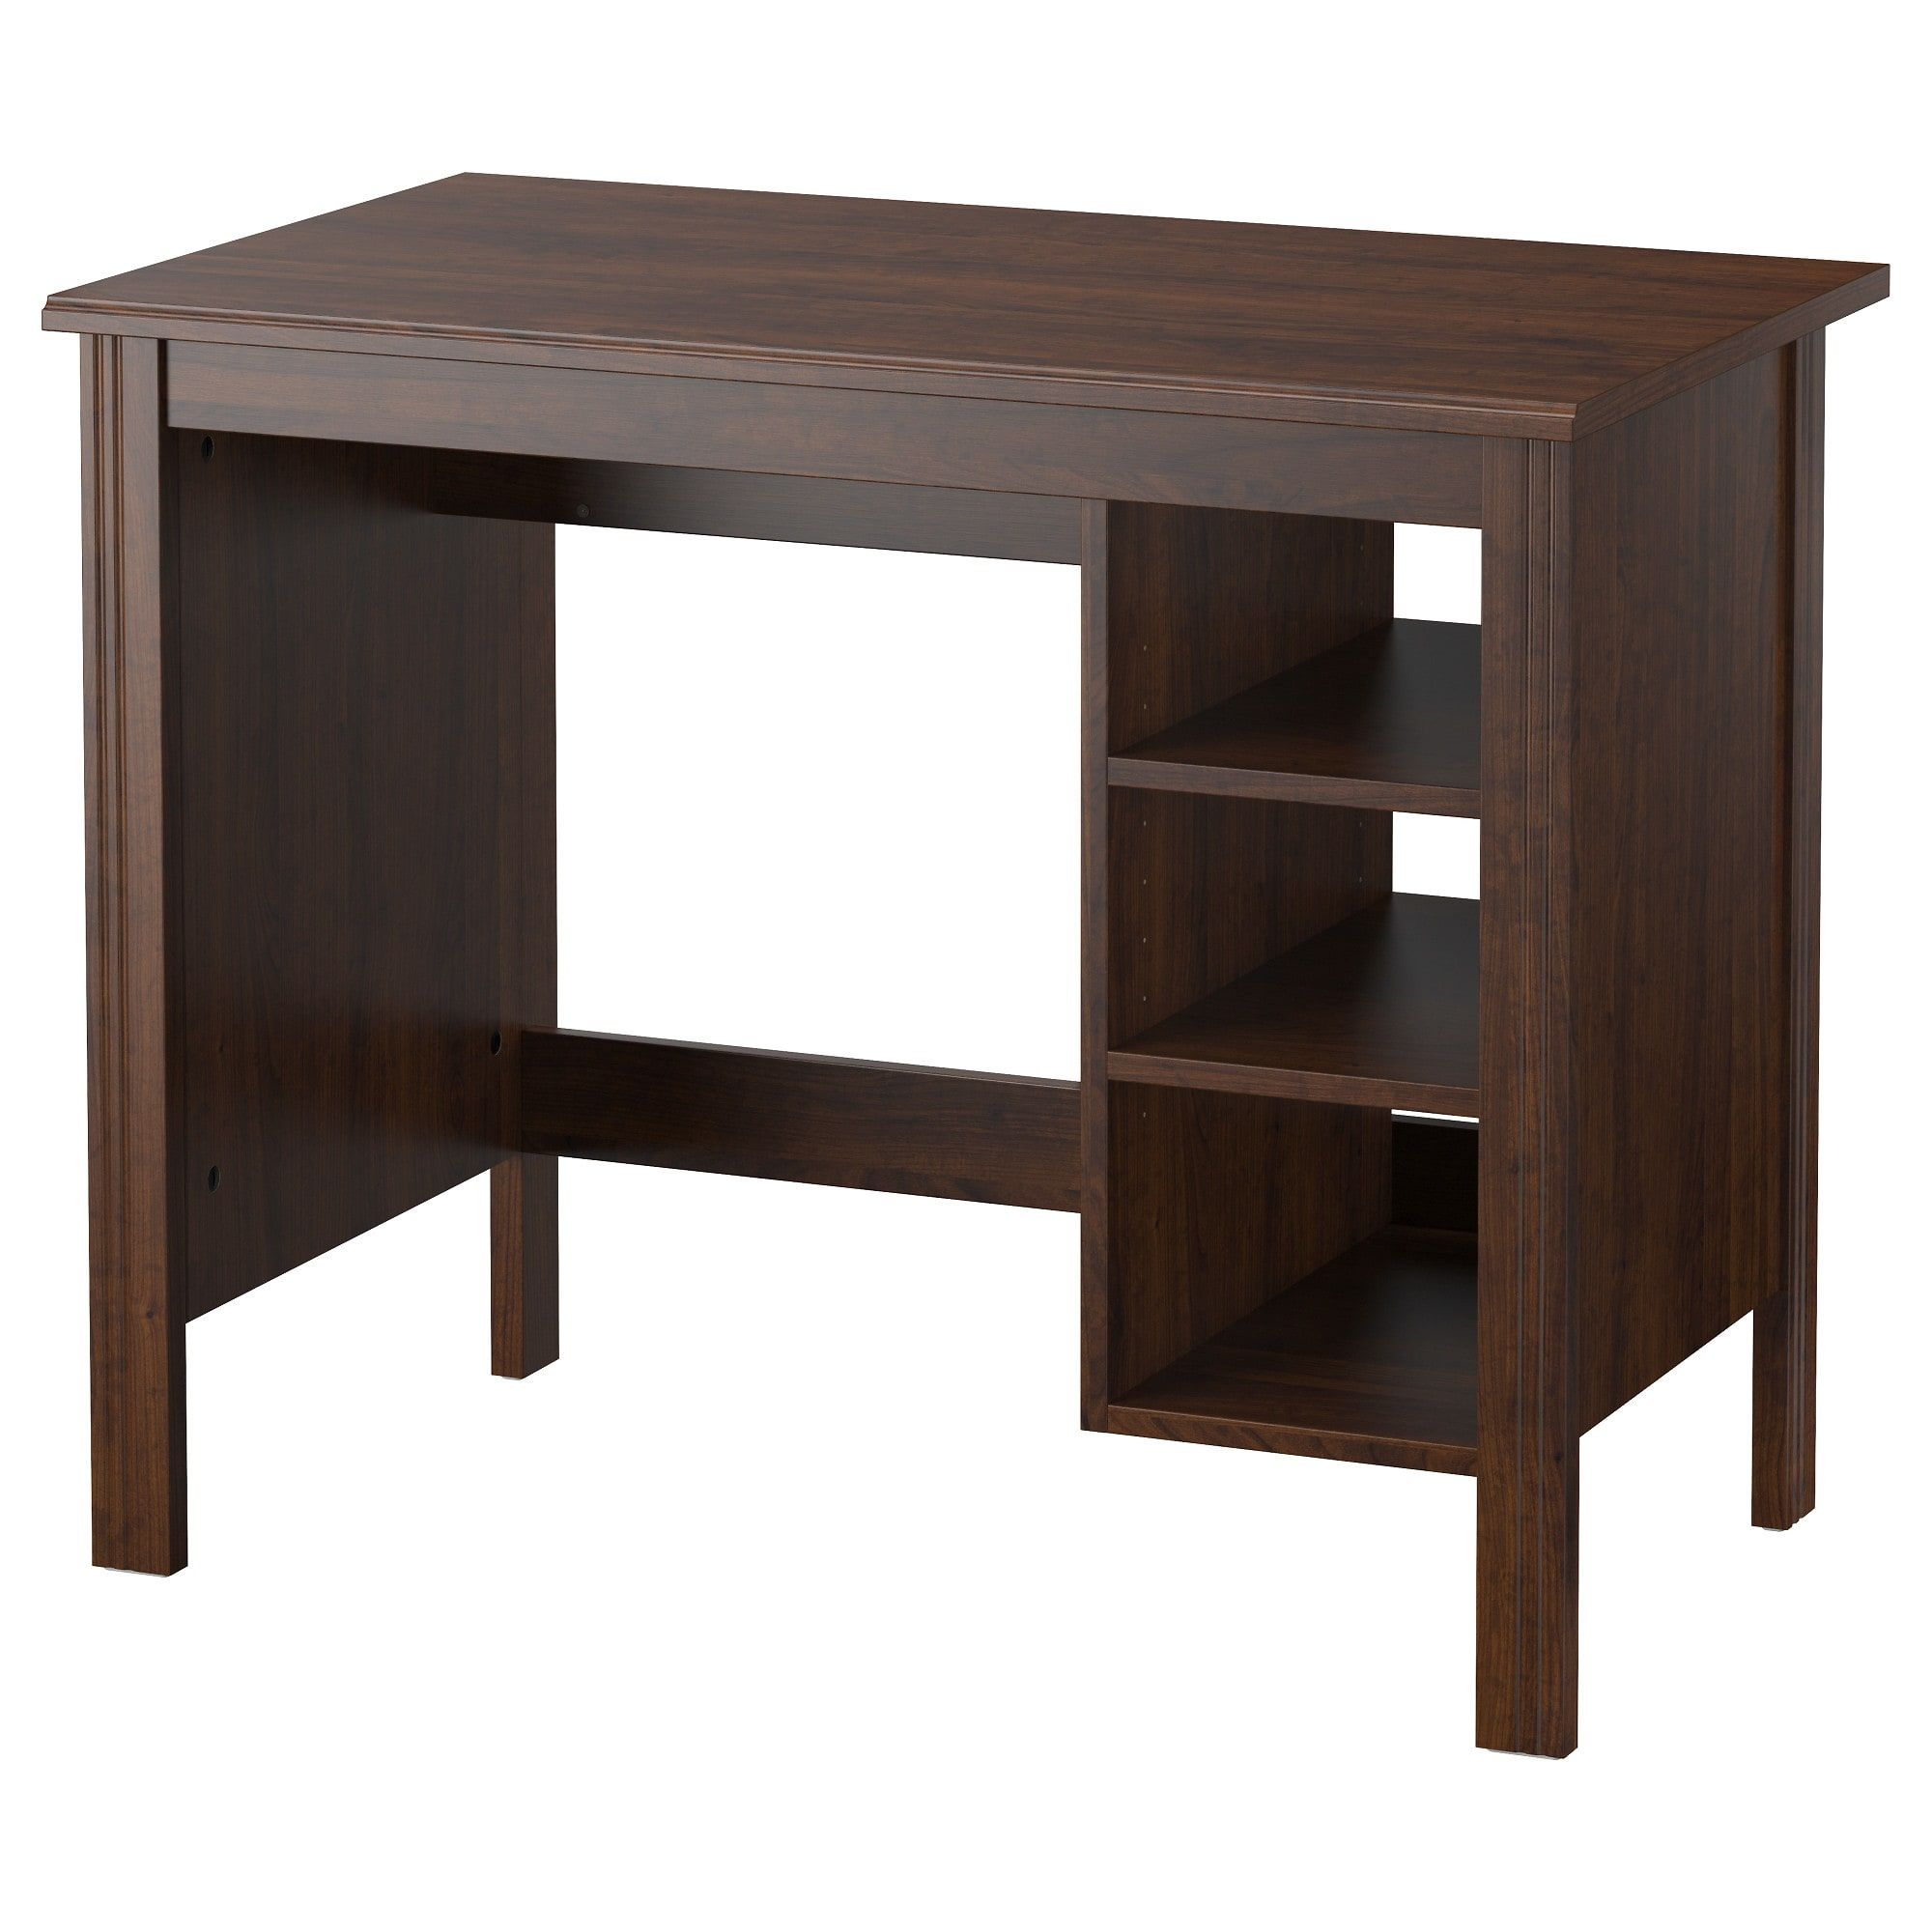 IKEA BRUSALI Brown Desk | Ikea brusali, Ikea desk, Home